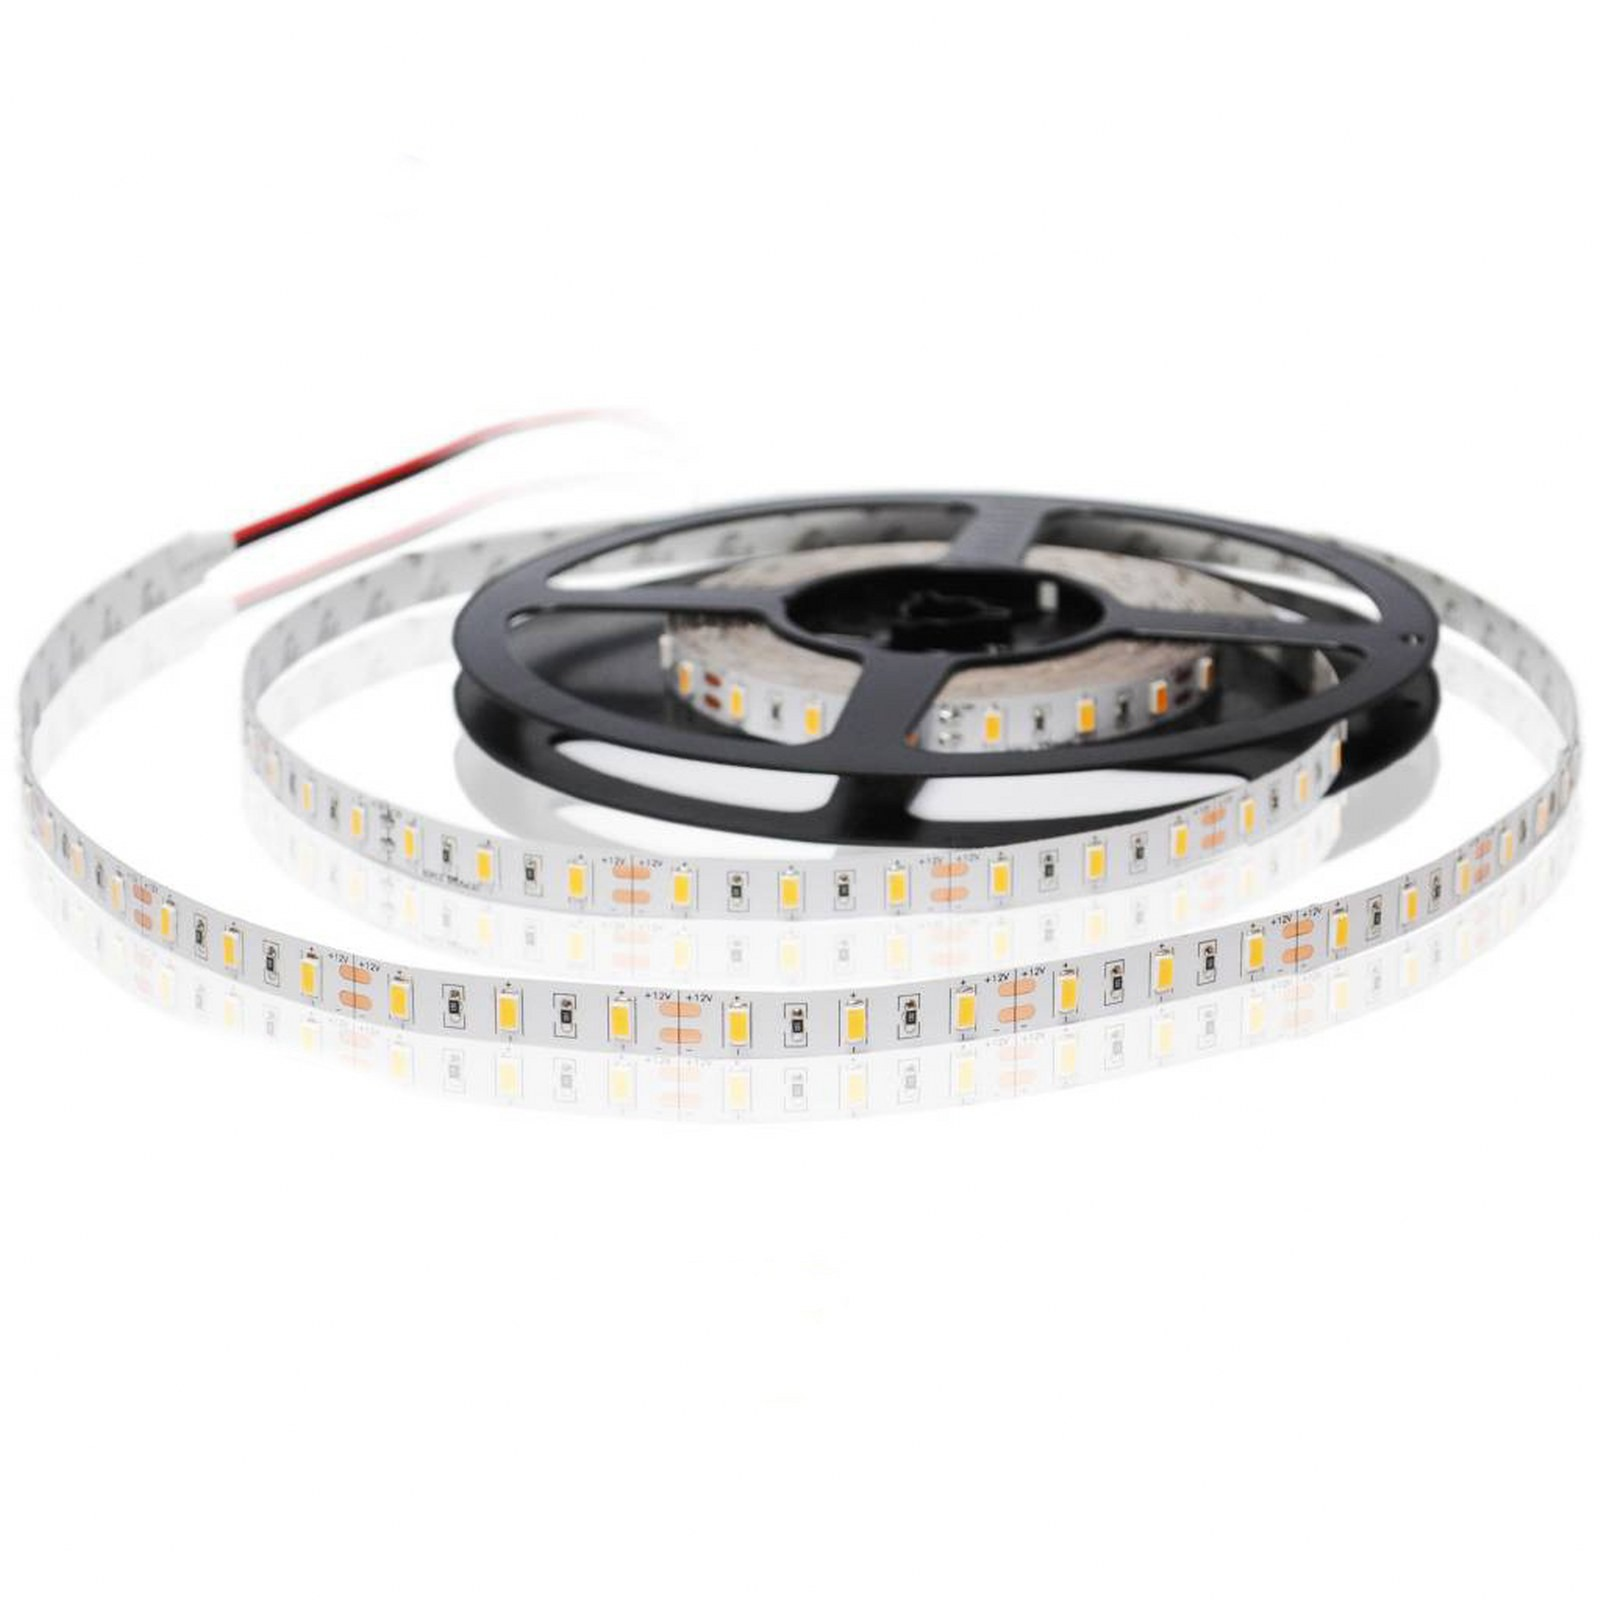 Striscia 300 led smd 3528 5 mt bobina v tac luce bianca for Luce bianca led